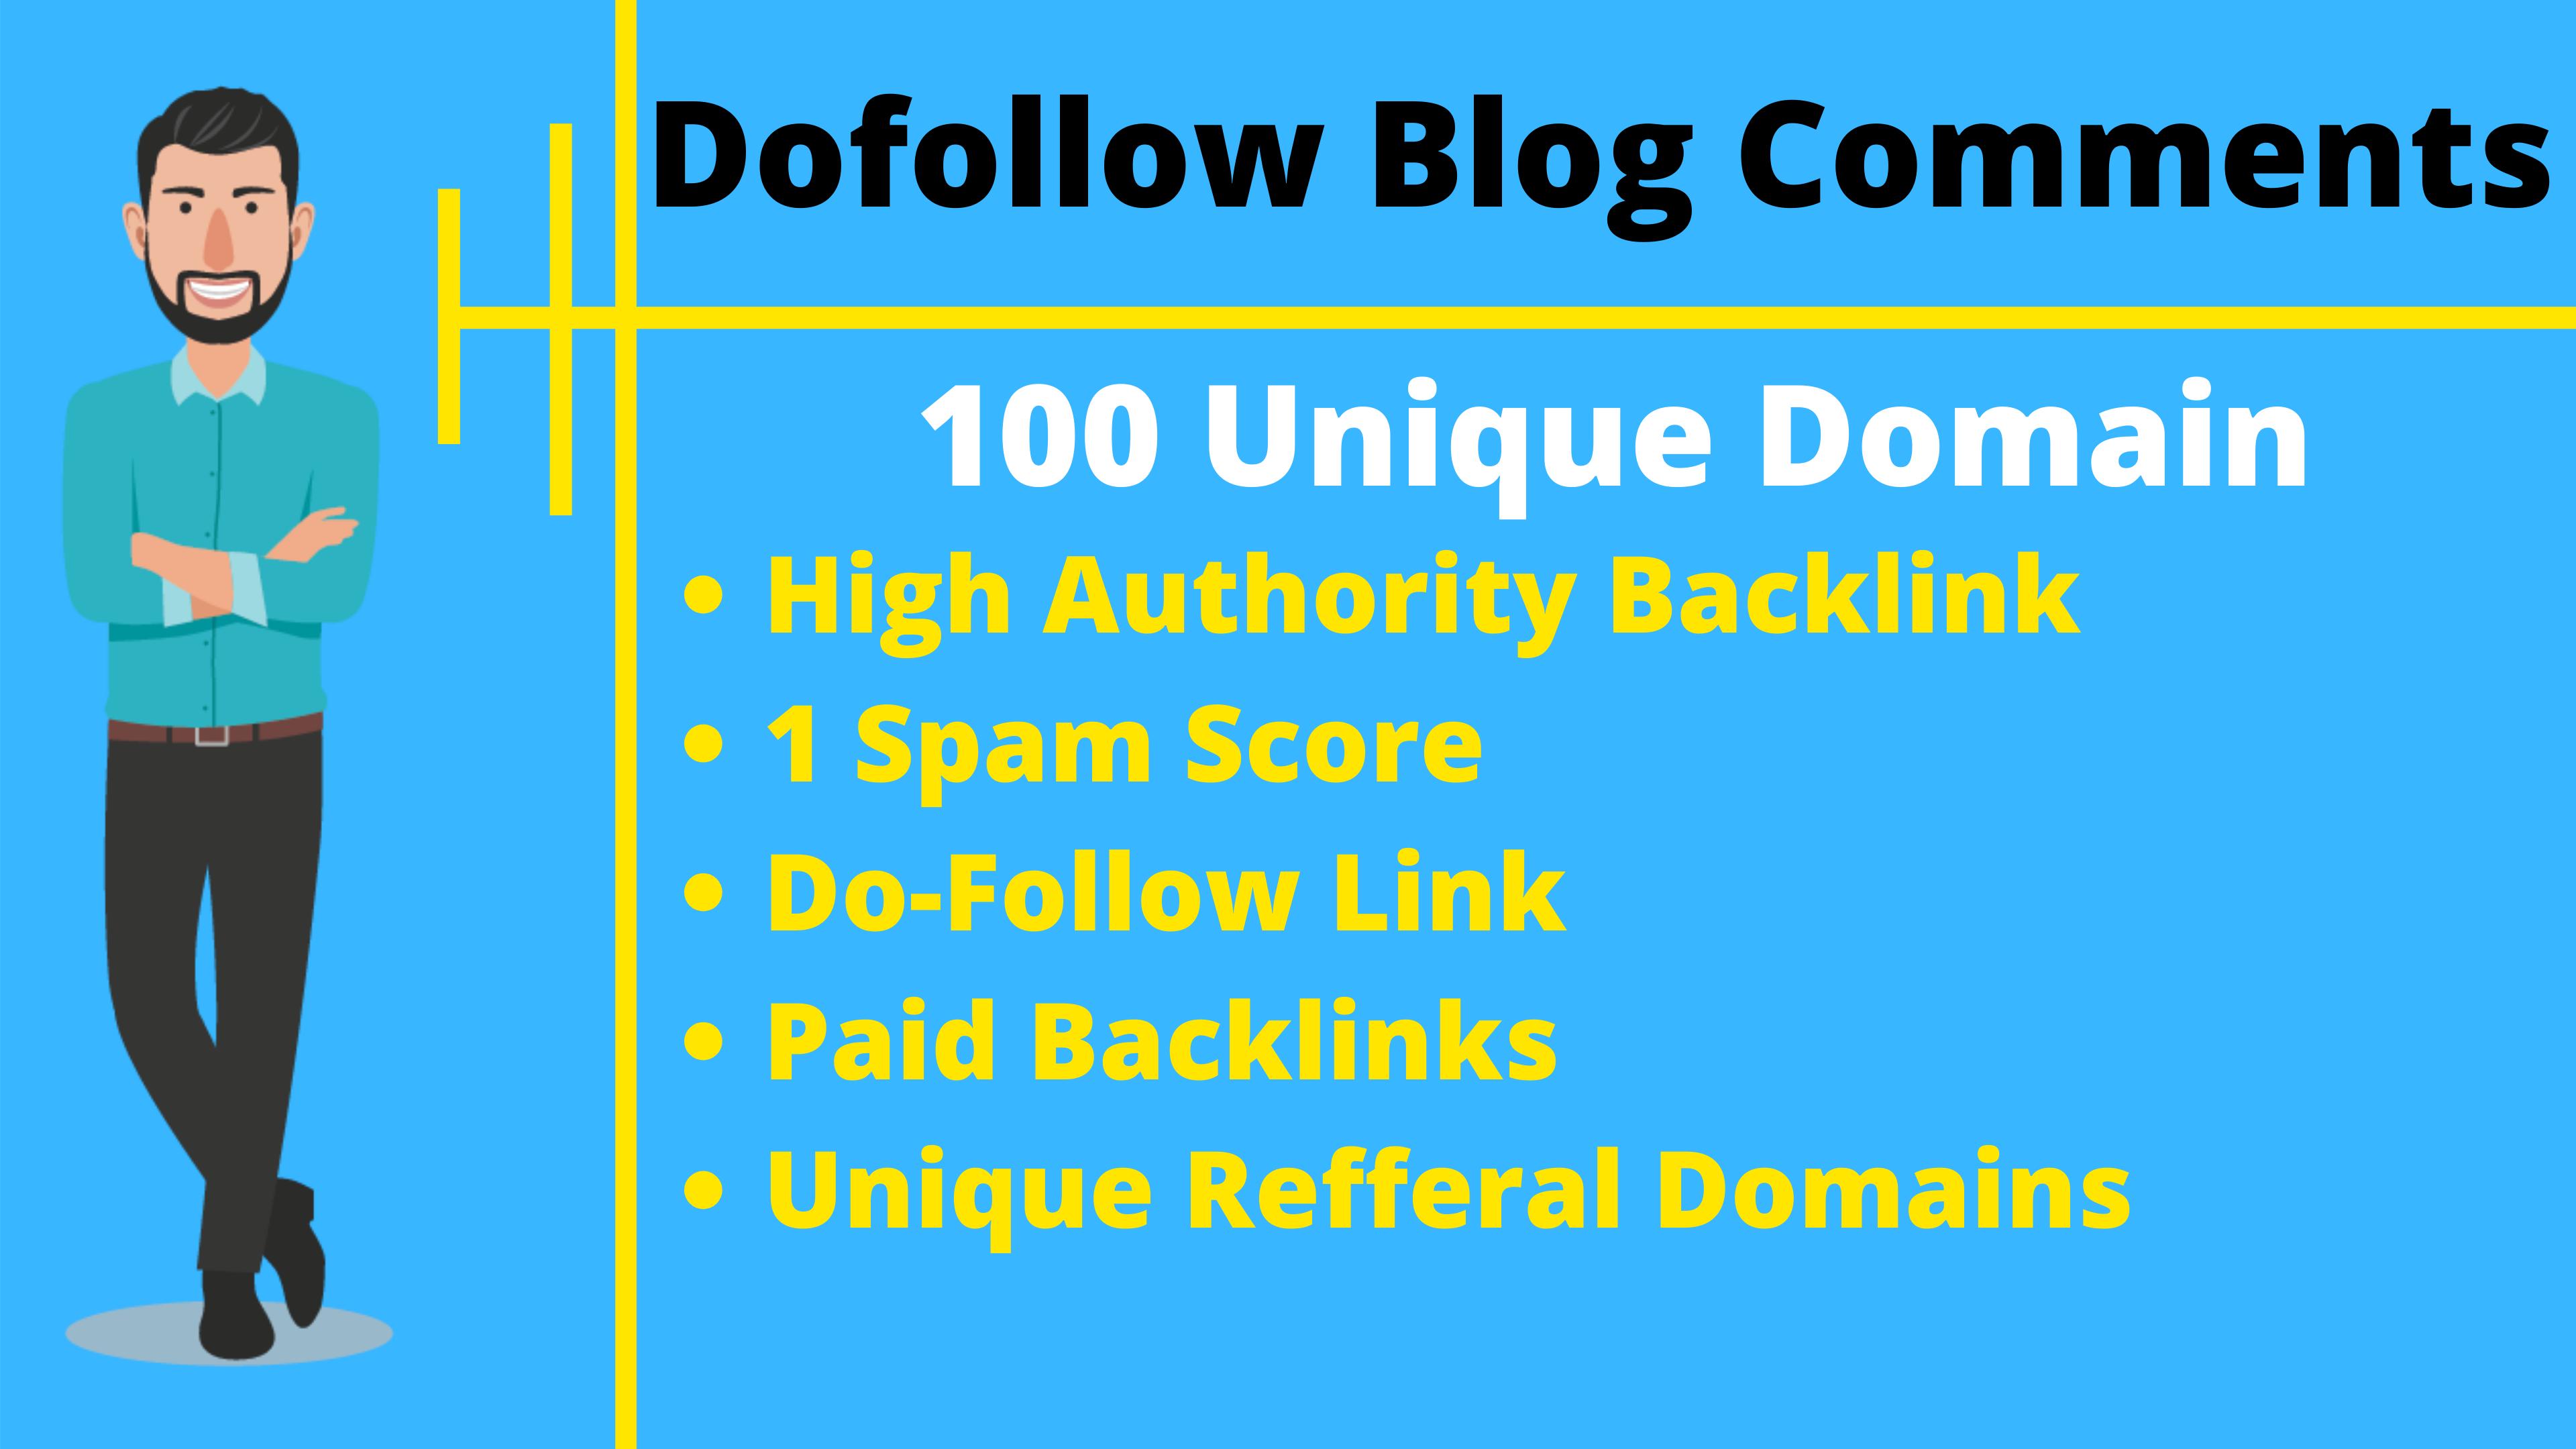 Manually create 100 dofollow blog comments SEO backlinks